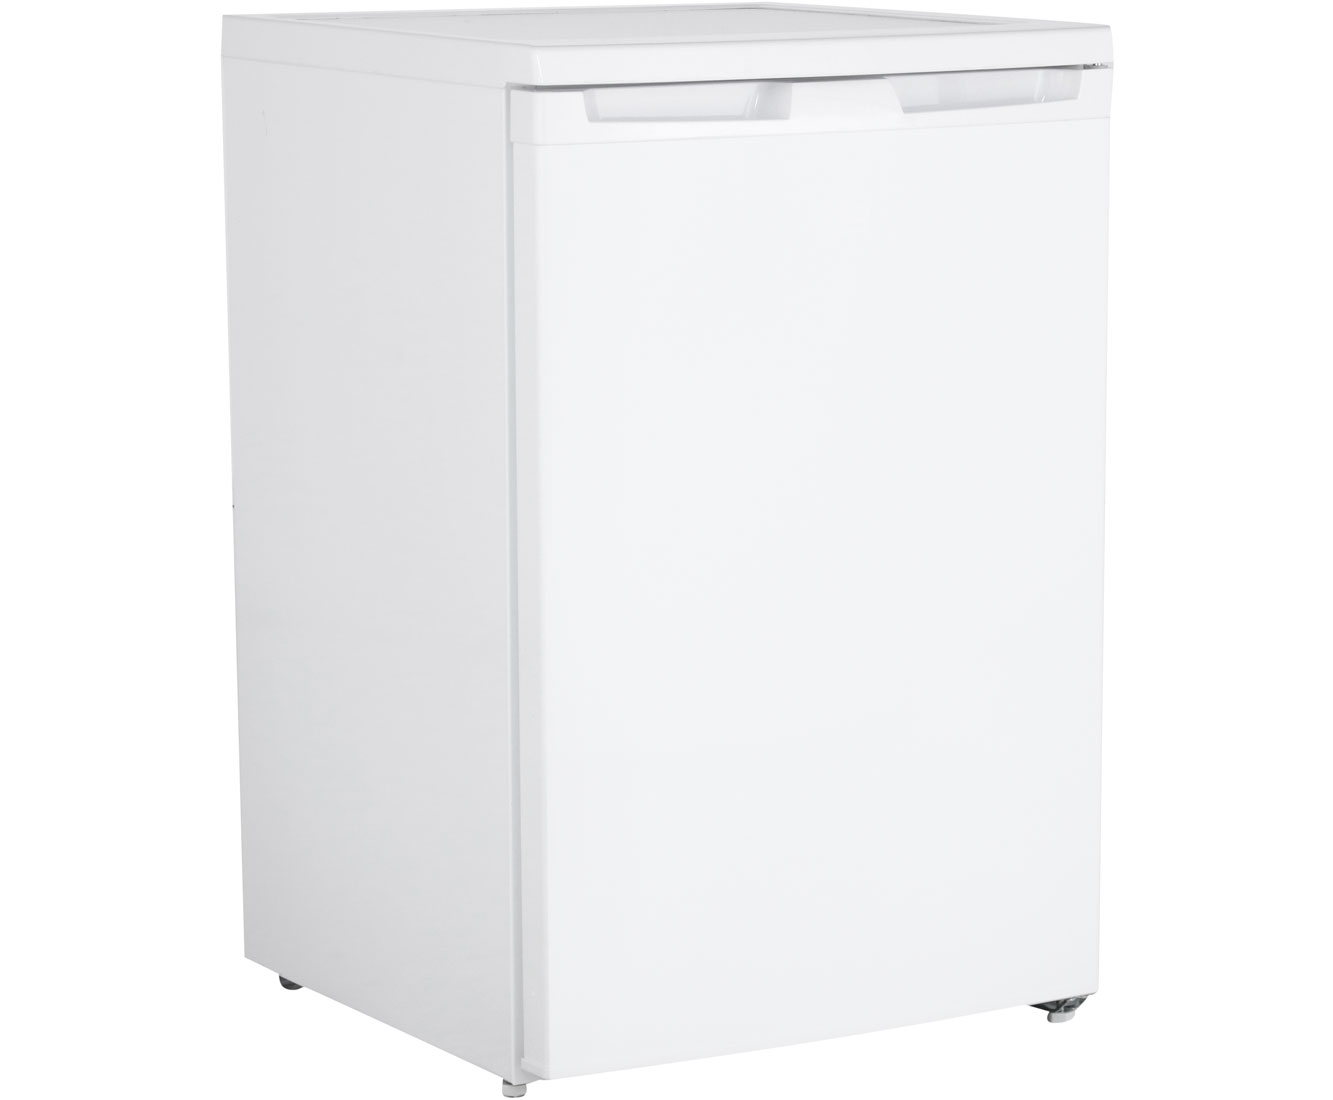 Beko TSE1423 Kühlschränke - Weiß